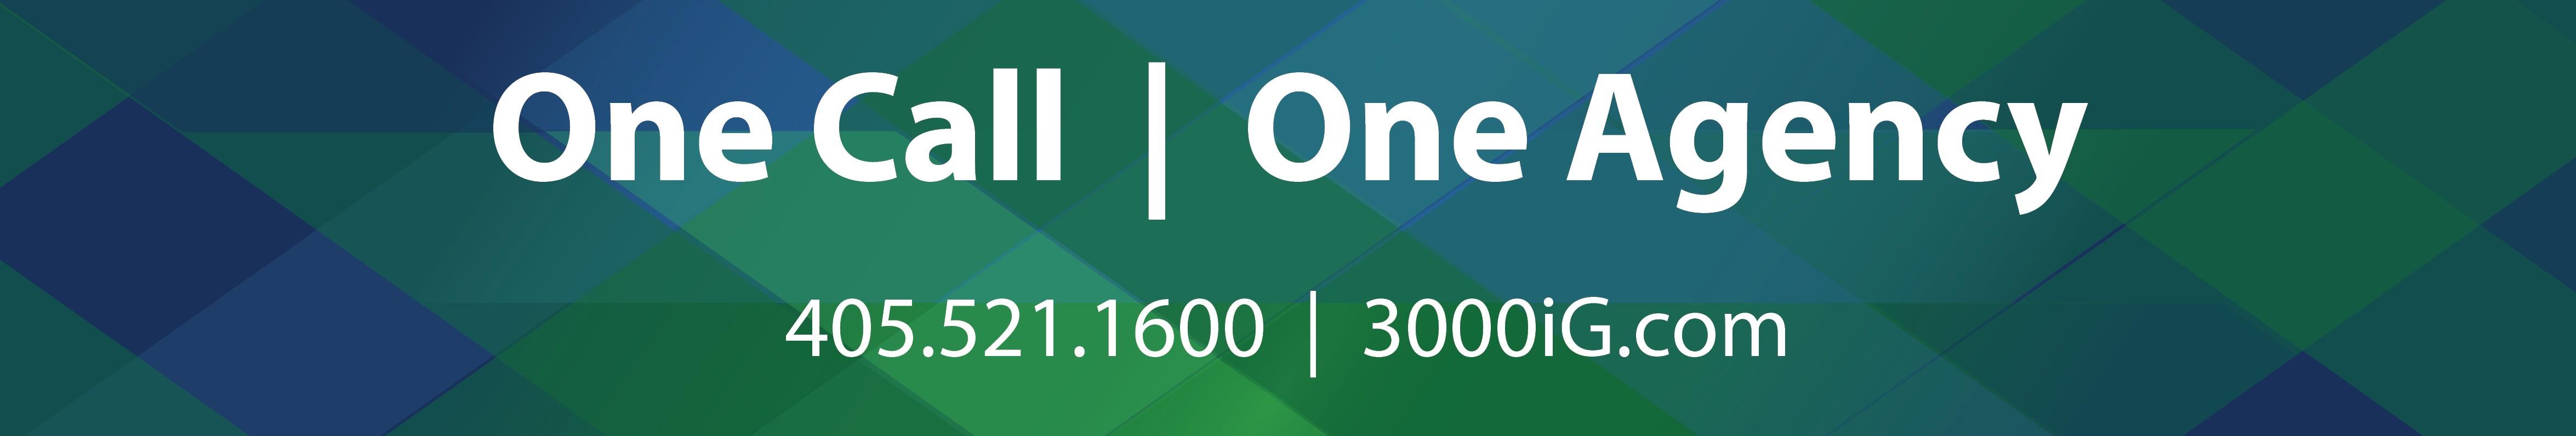 3000 Insurance Group Linkedin